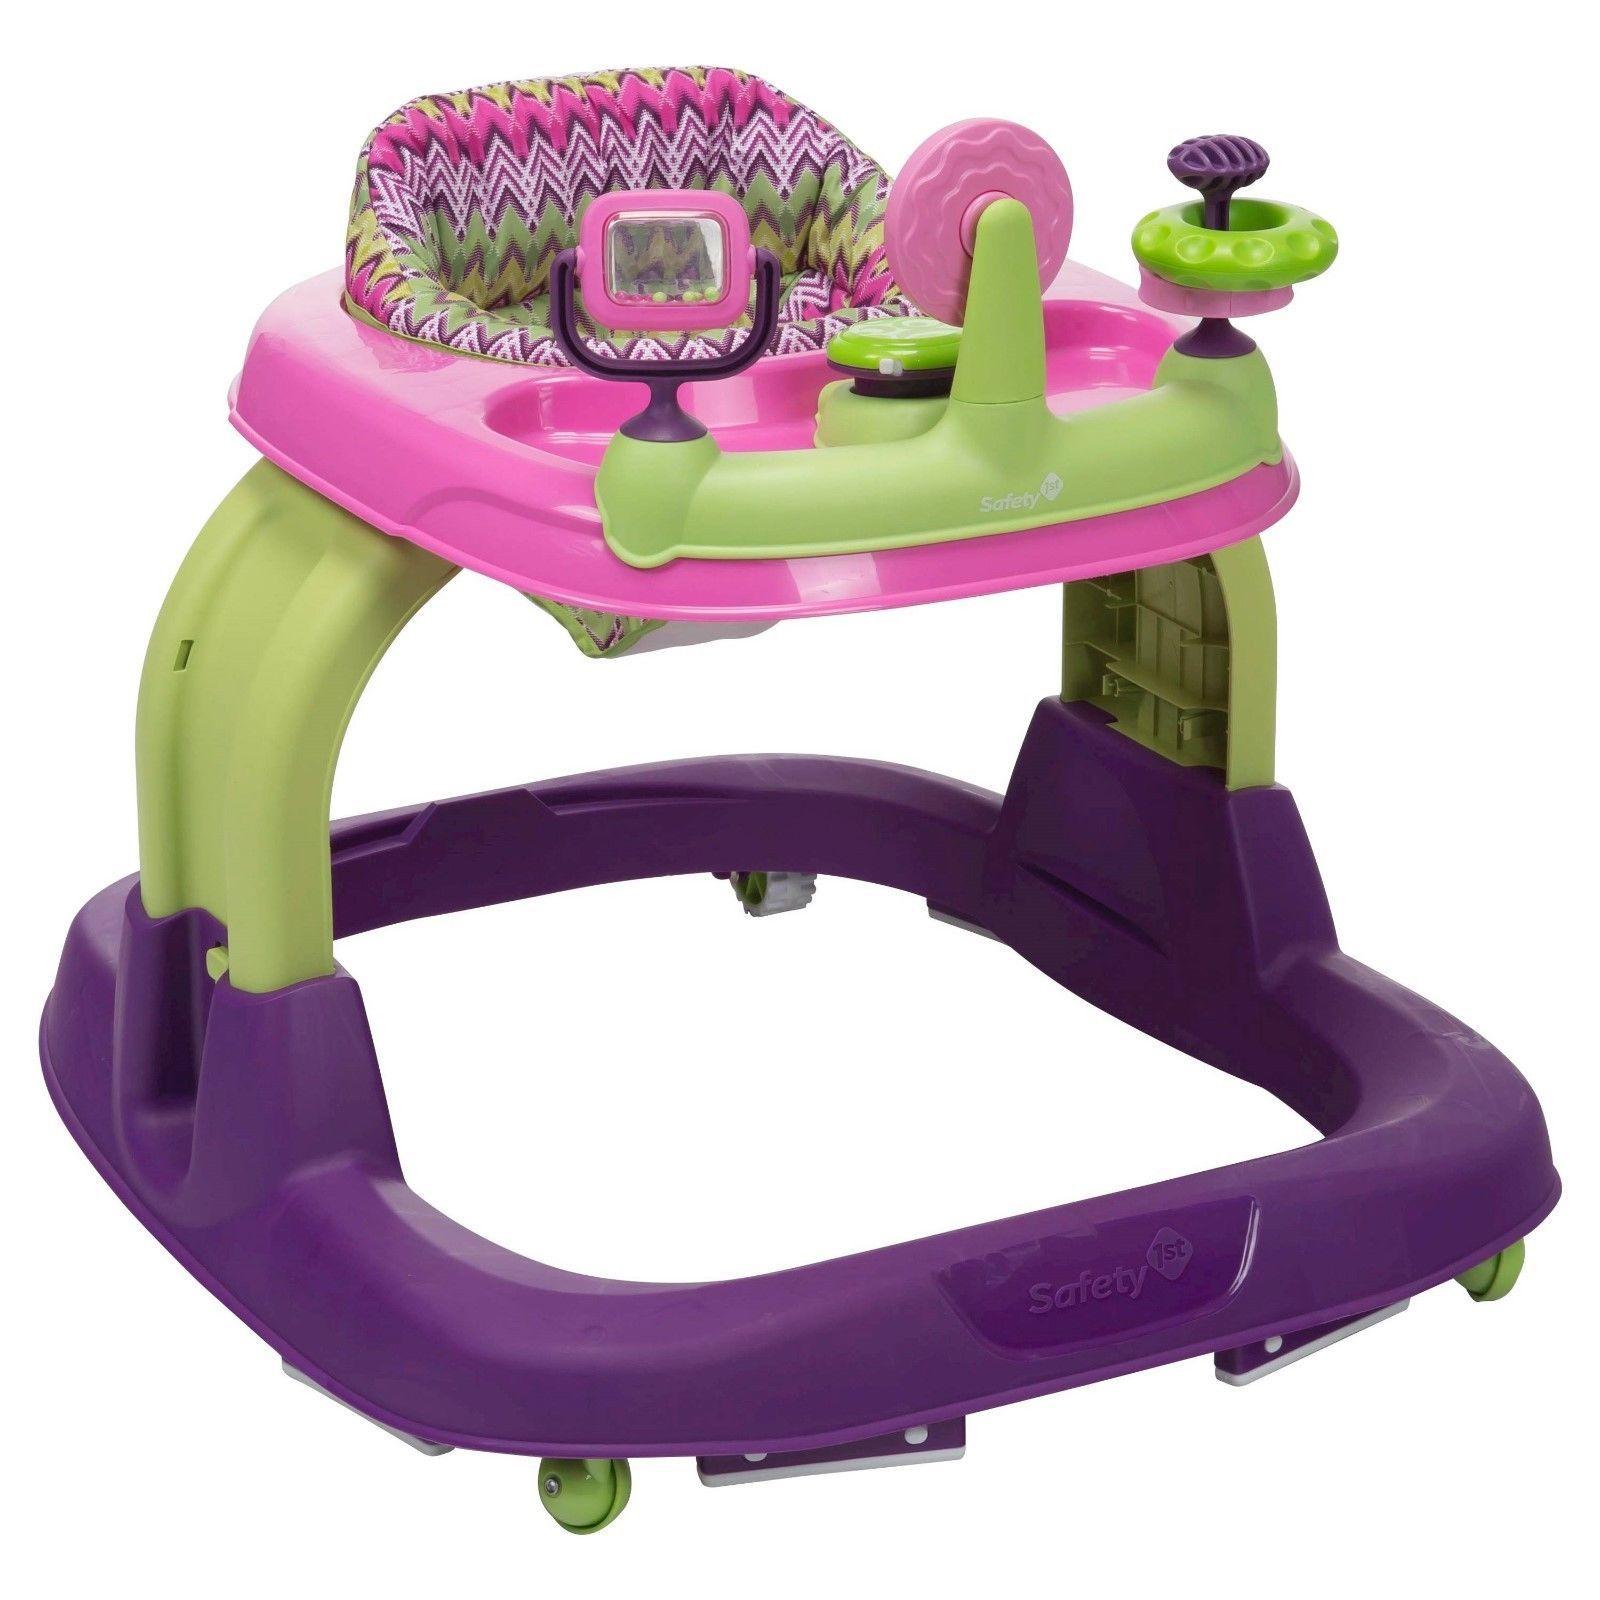 Safety 1st Ready, Set, Walk Child Kid Toddler Boy Girl